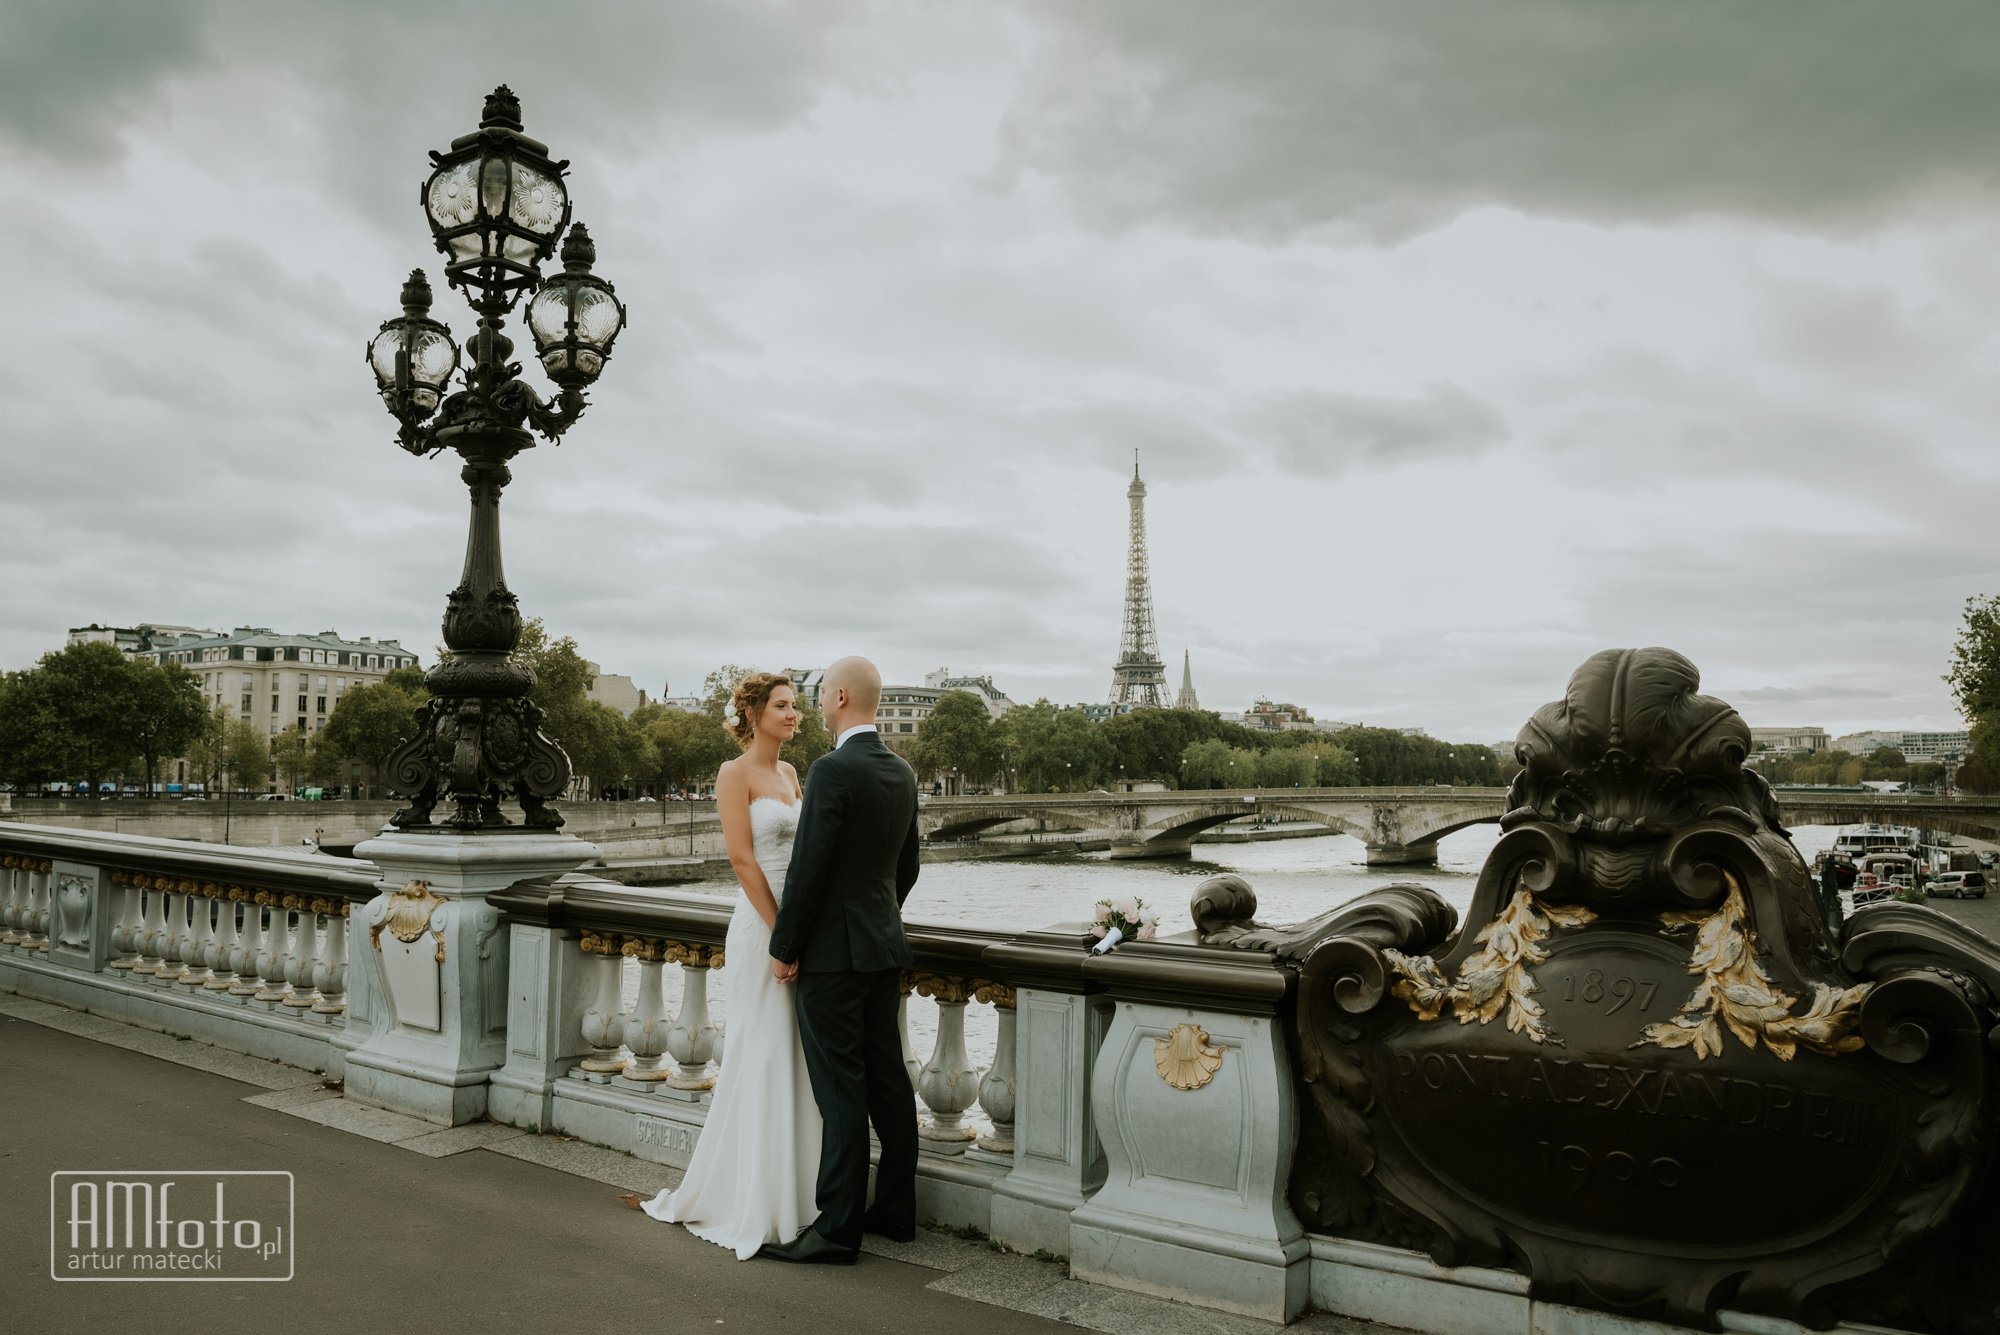 0257_Izabela&Olivier_plener_slubny_sesja_poslubna_francja_paryz____www-amfoto-pl__AMF_8651.jpg